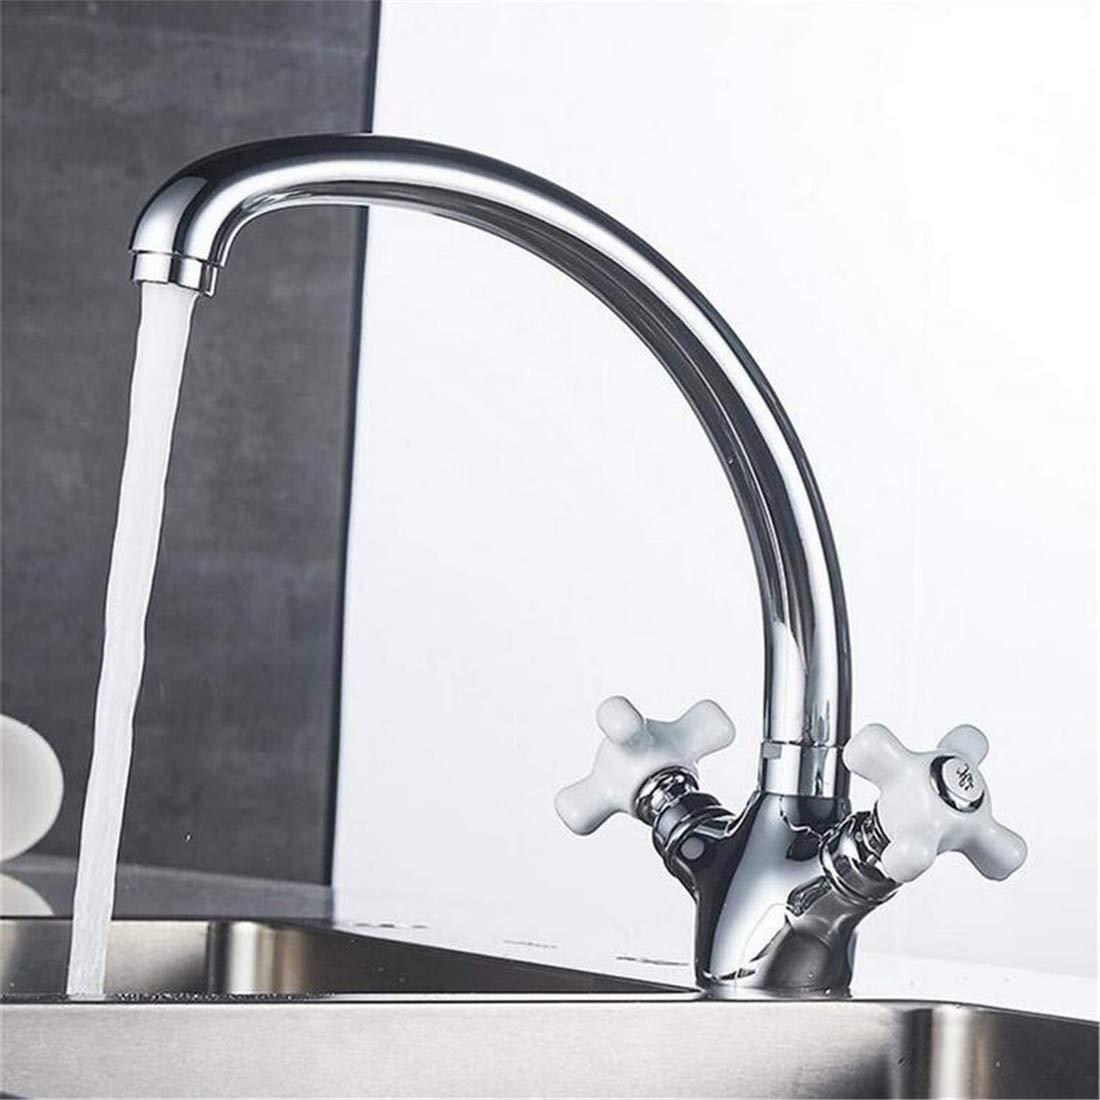 Modern High Quality Vintage Faucetmixer Double Handle Torneira Cozinha 360 Degree Rotation